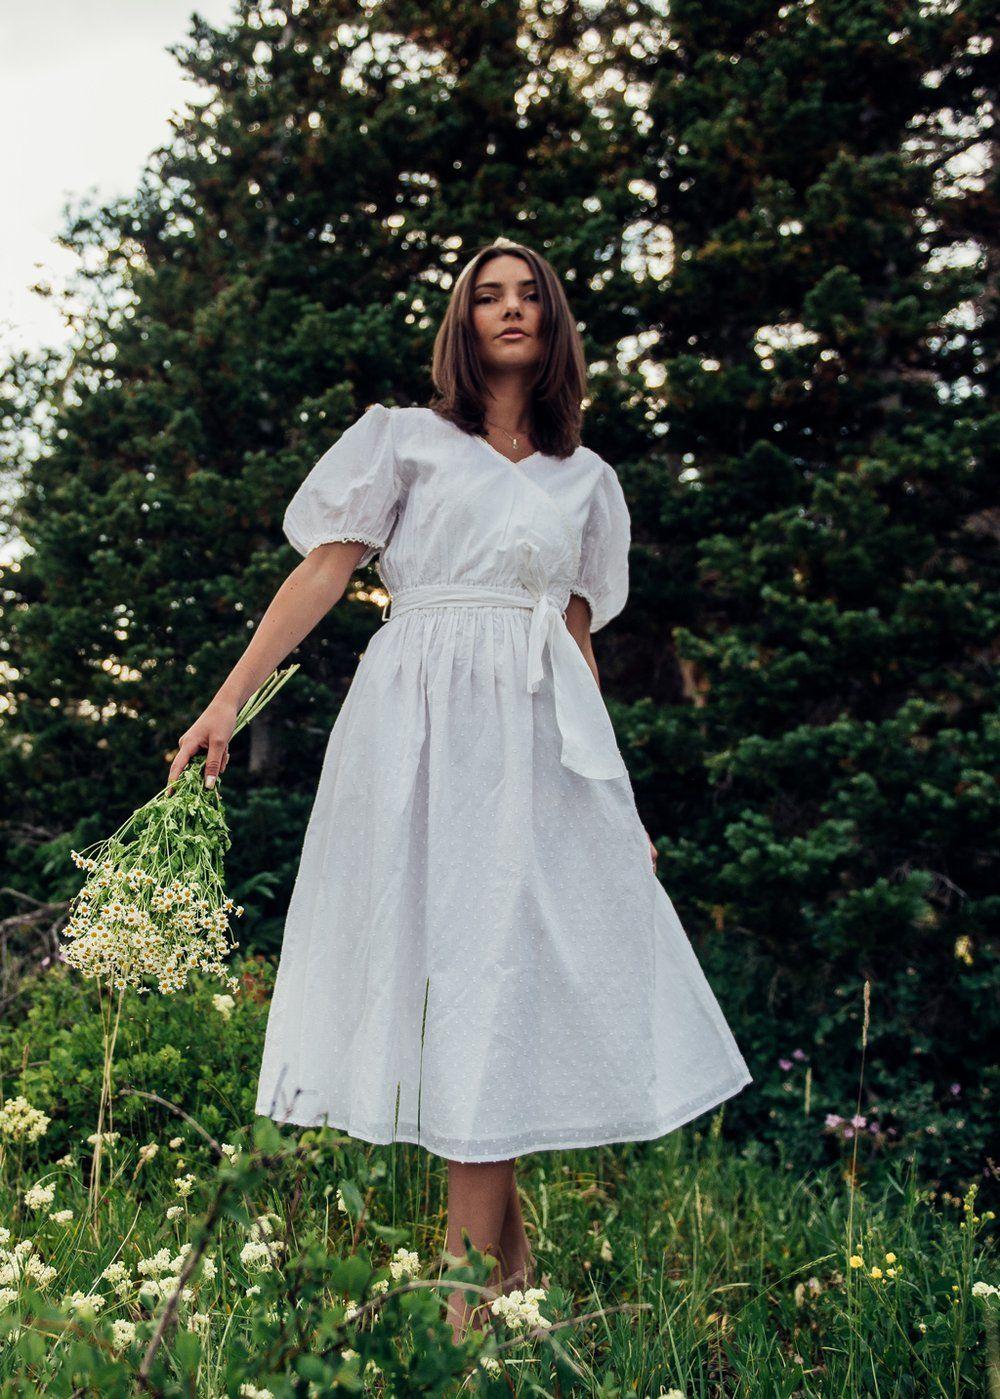 Sowerby Swiss Dot Dress Dresses White Flowy Dress Pre Debut Photoshoot [ 1399 x 1000 Pixel ]